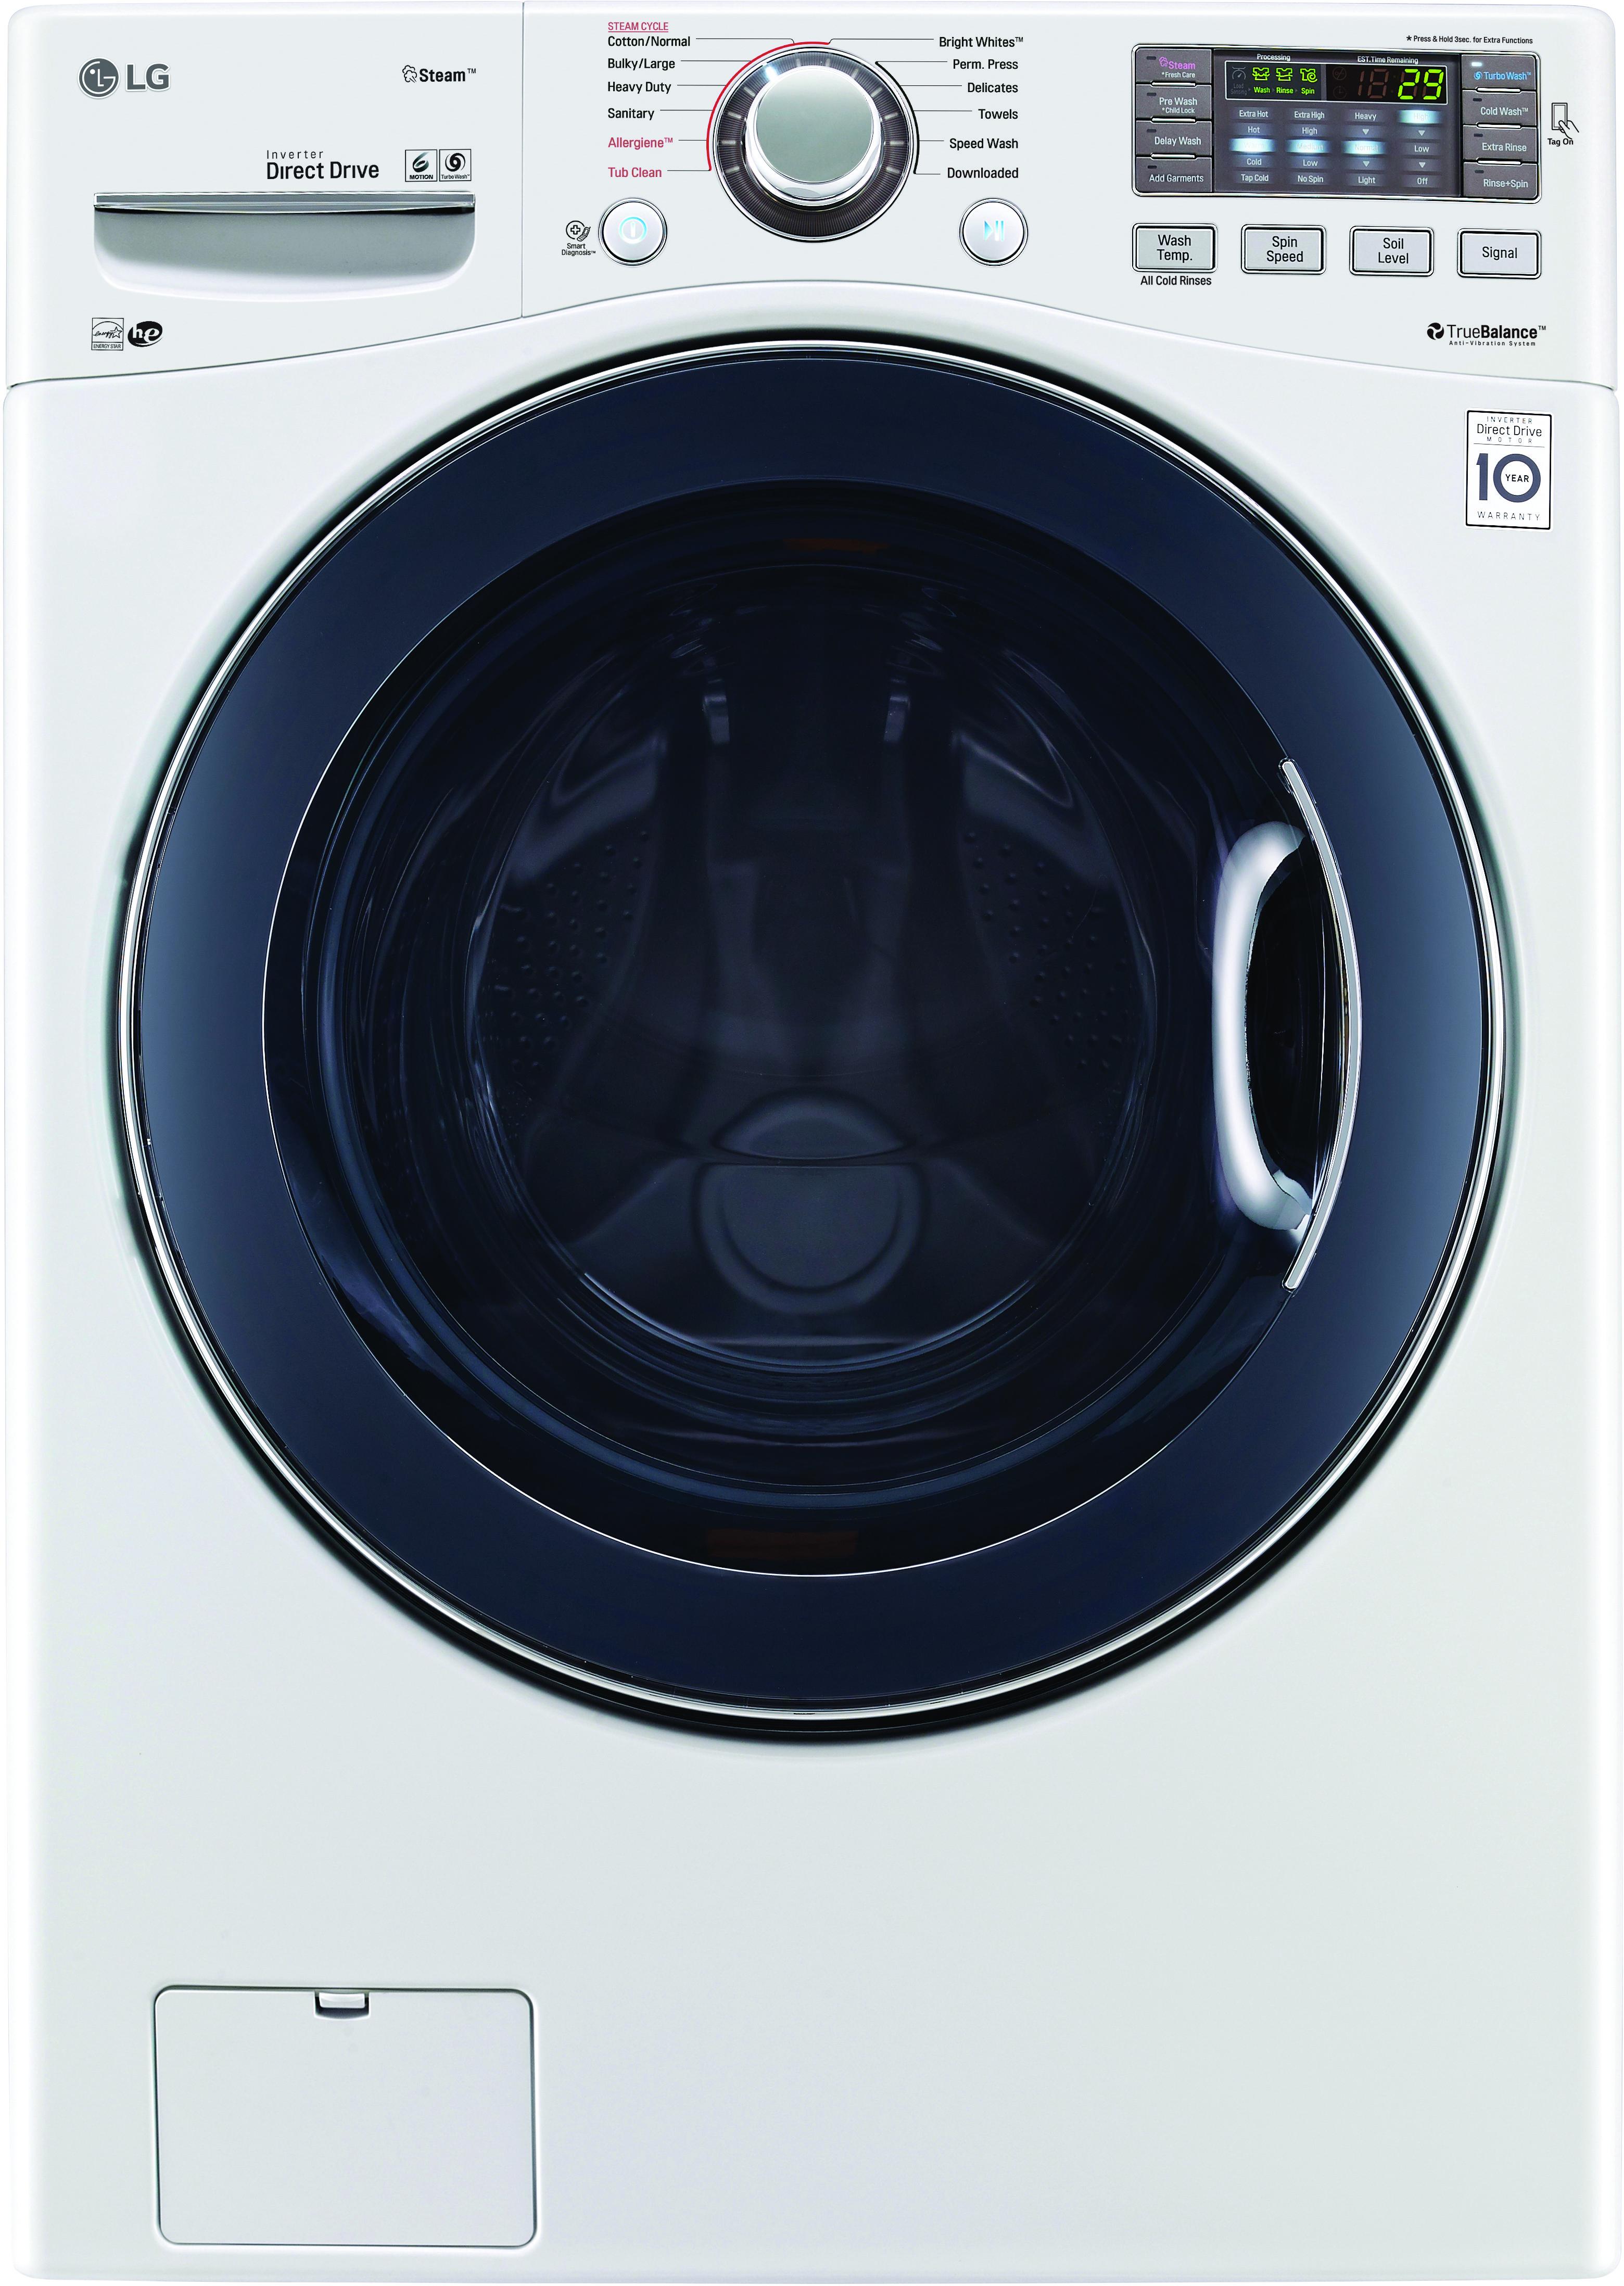 washer wm3770hwa